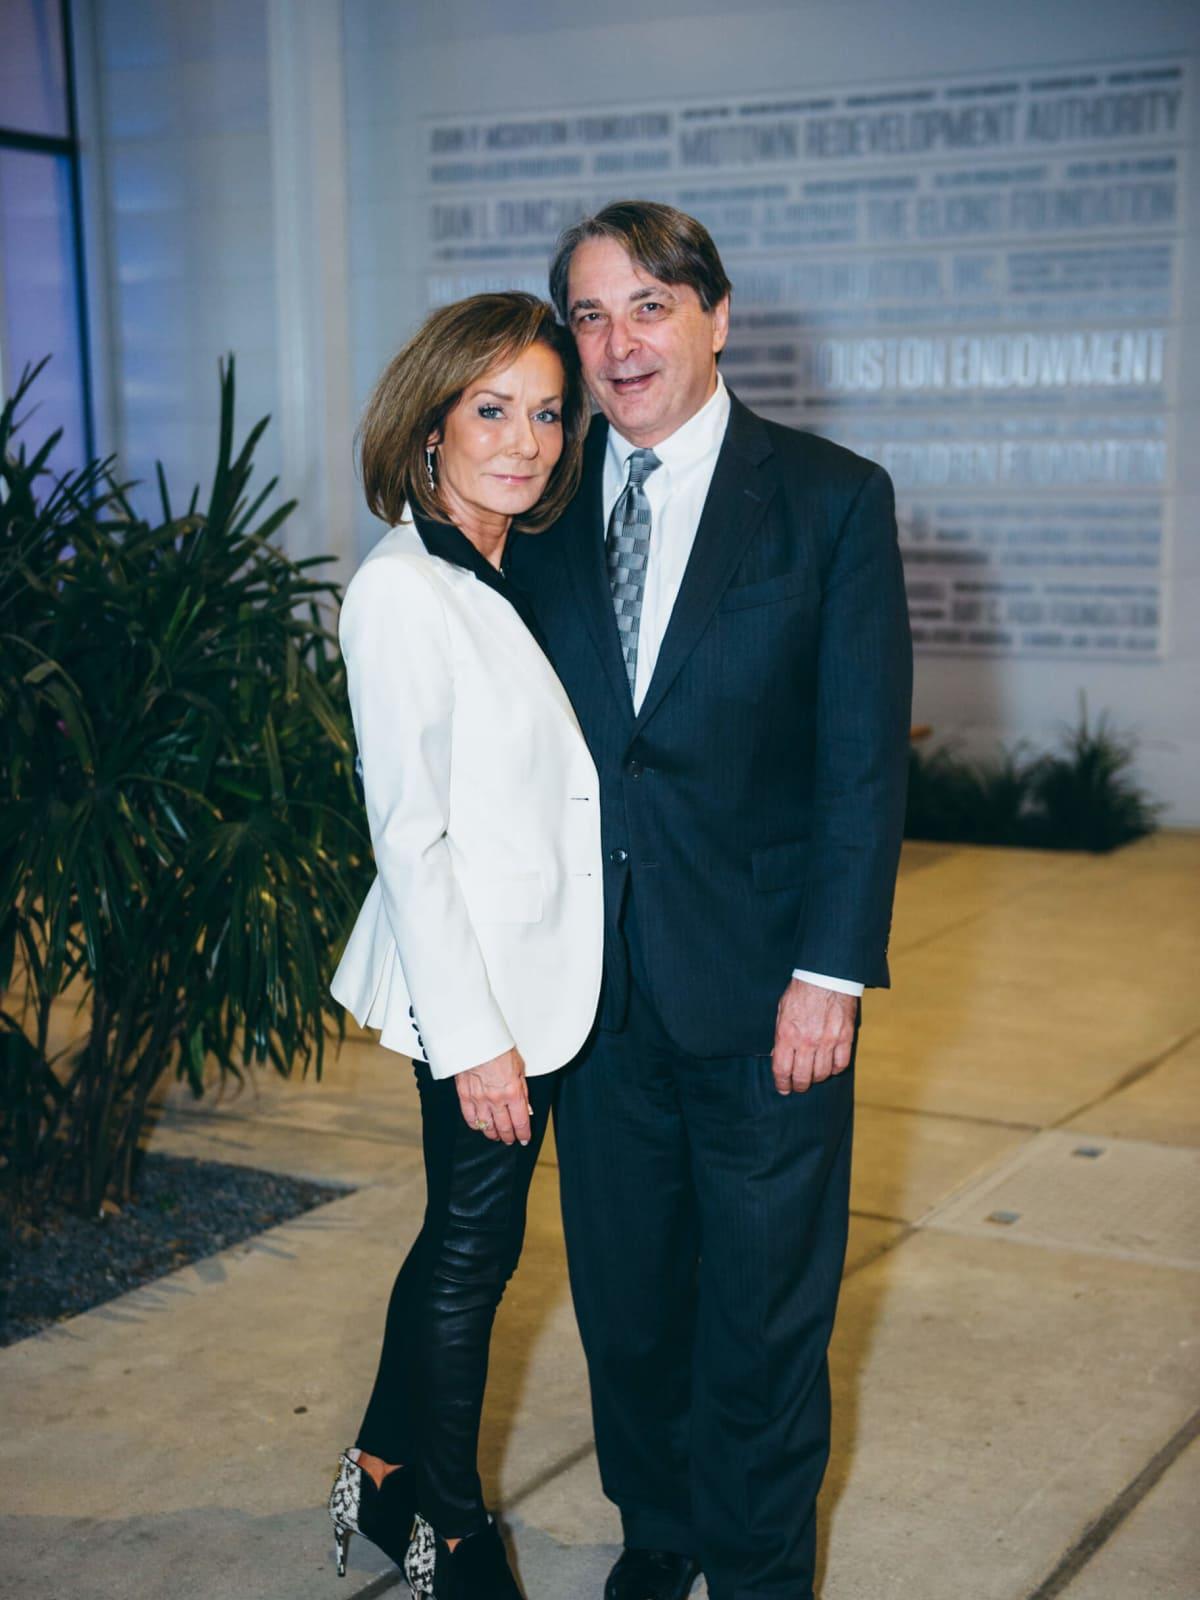 Gulf Coast Journal gala, Melanie Gray, Mark Wawro